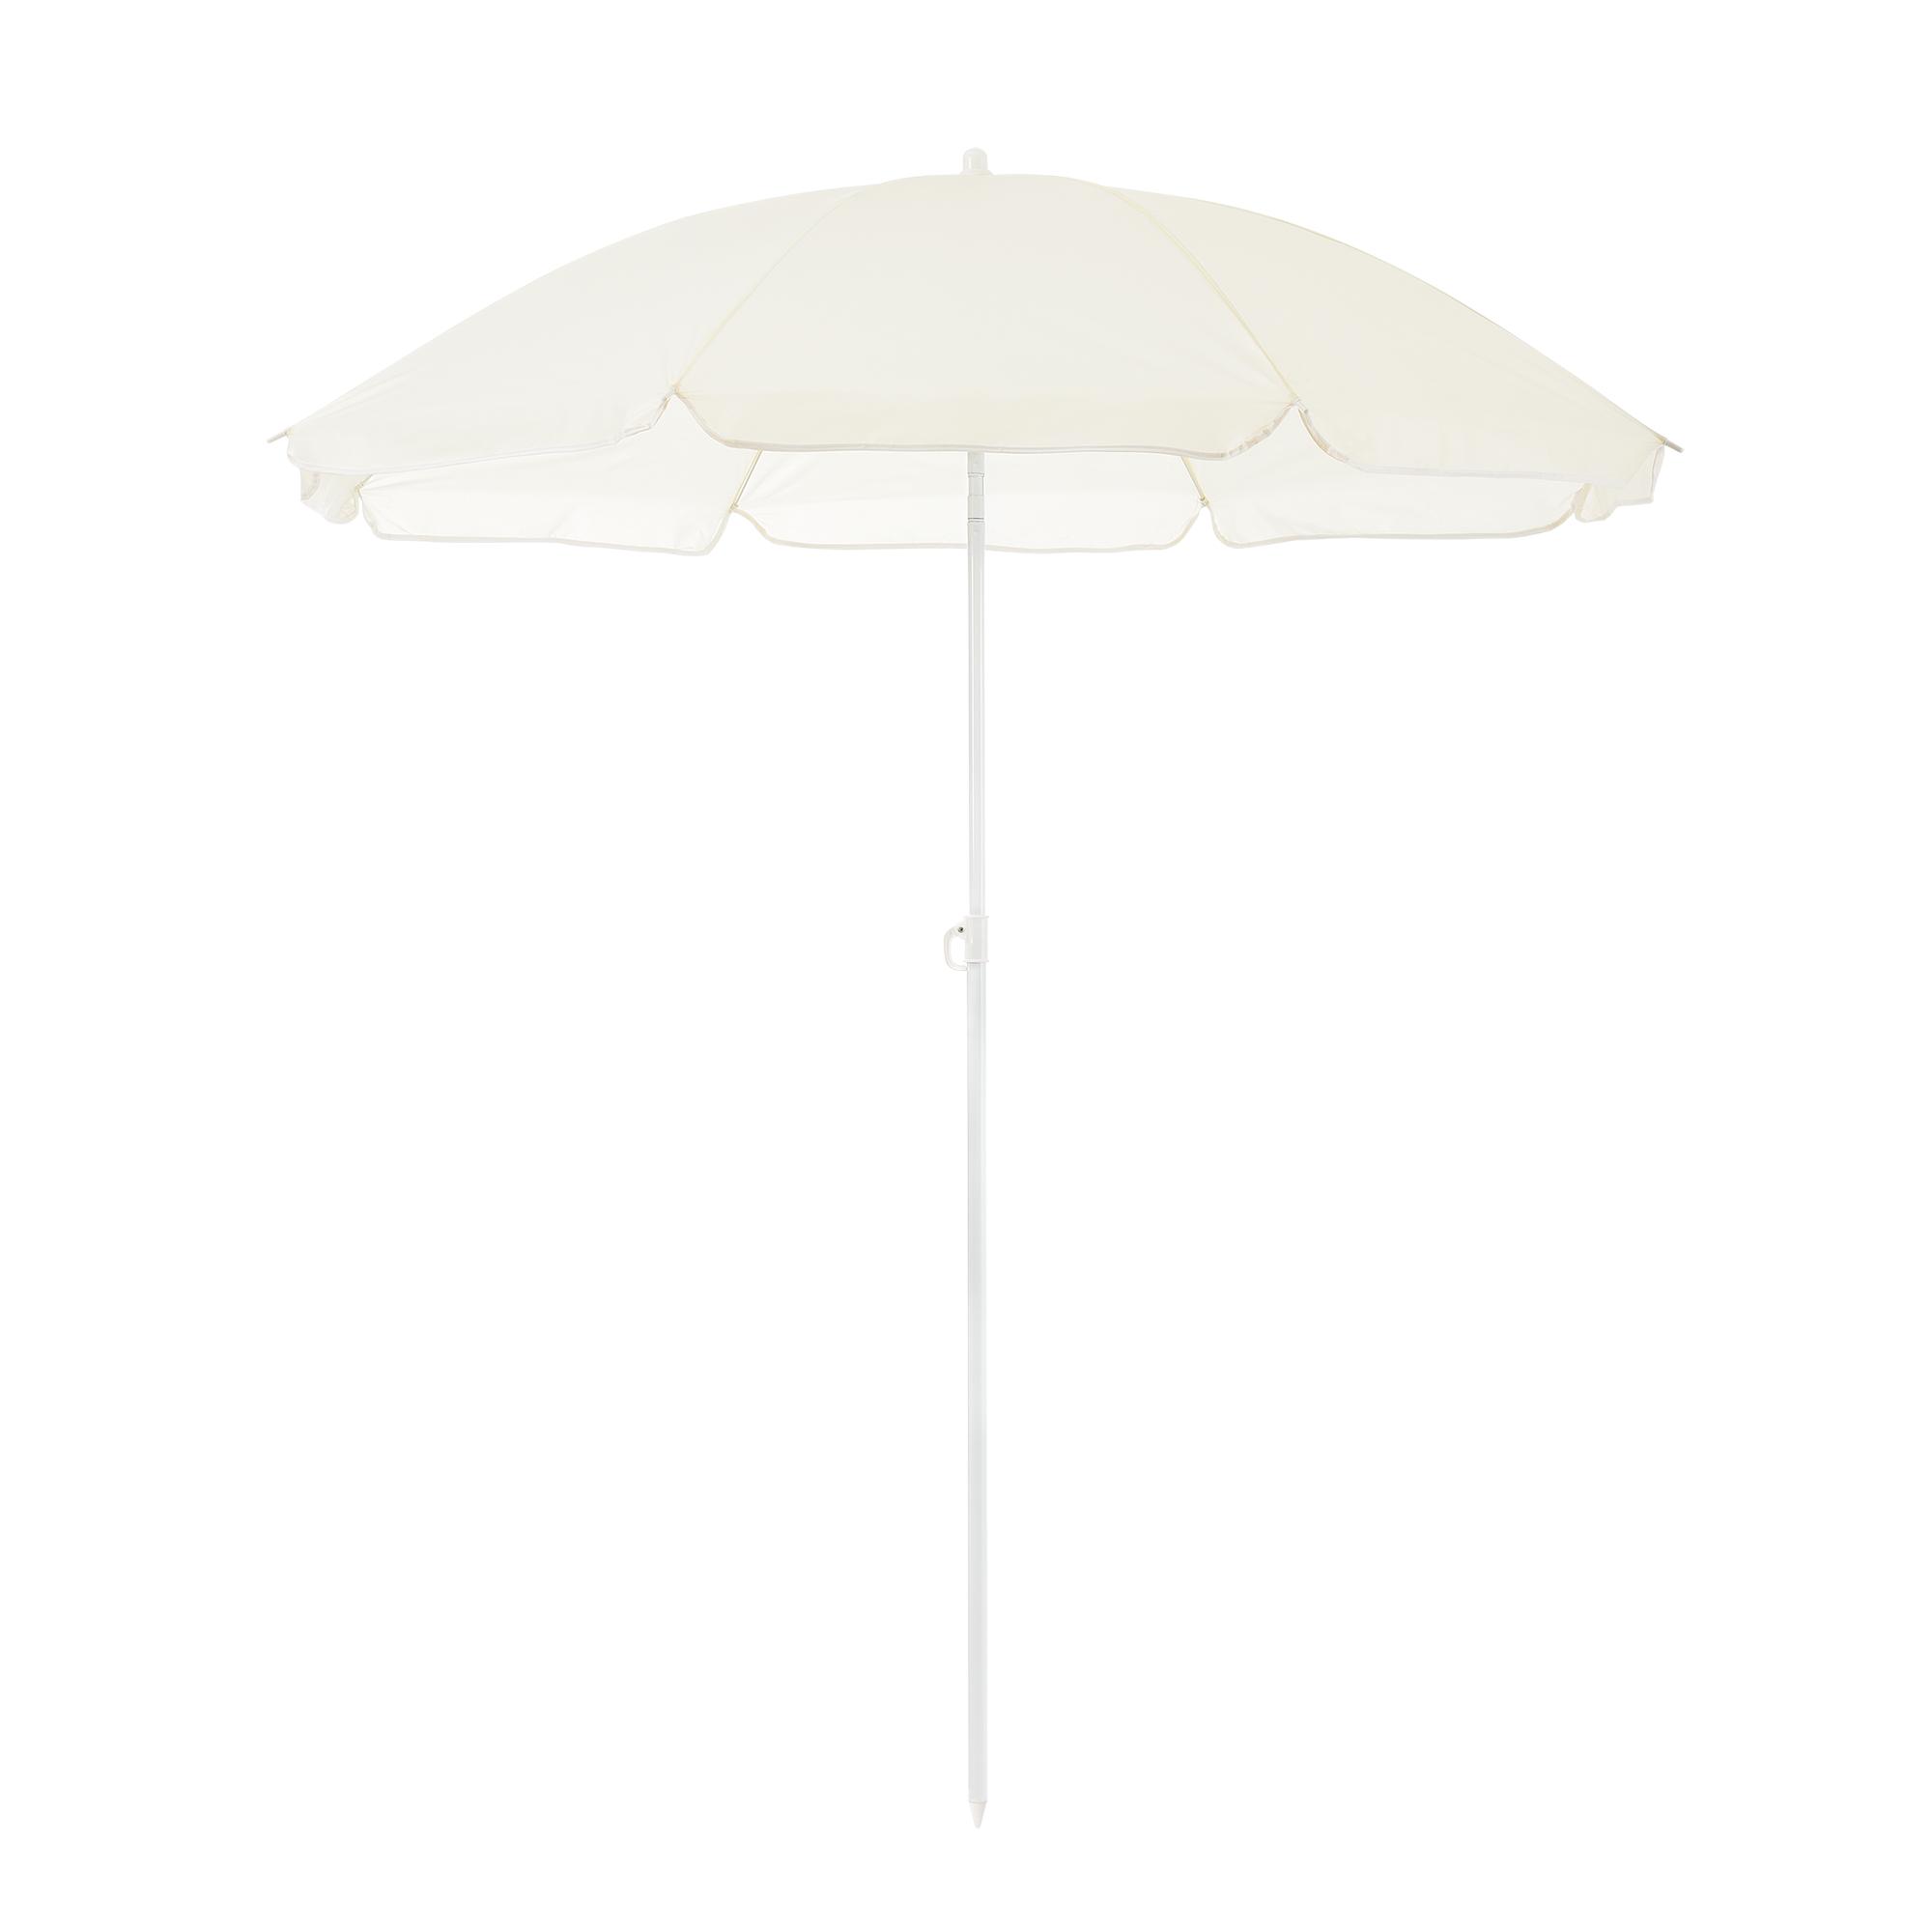 strandschirm 180cm creme sonnenschirm schirm gartenschirm knickgelenk ebay. Black Bedroom Furniture Sets. Home Design Ideas